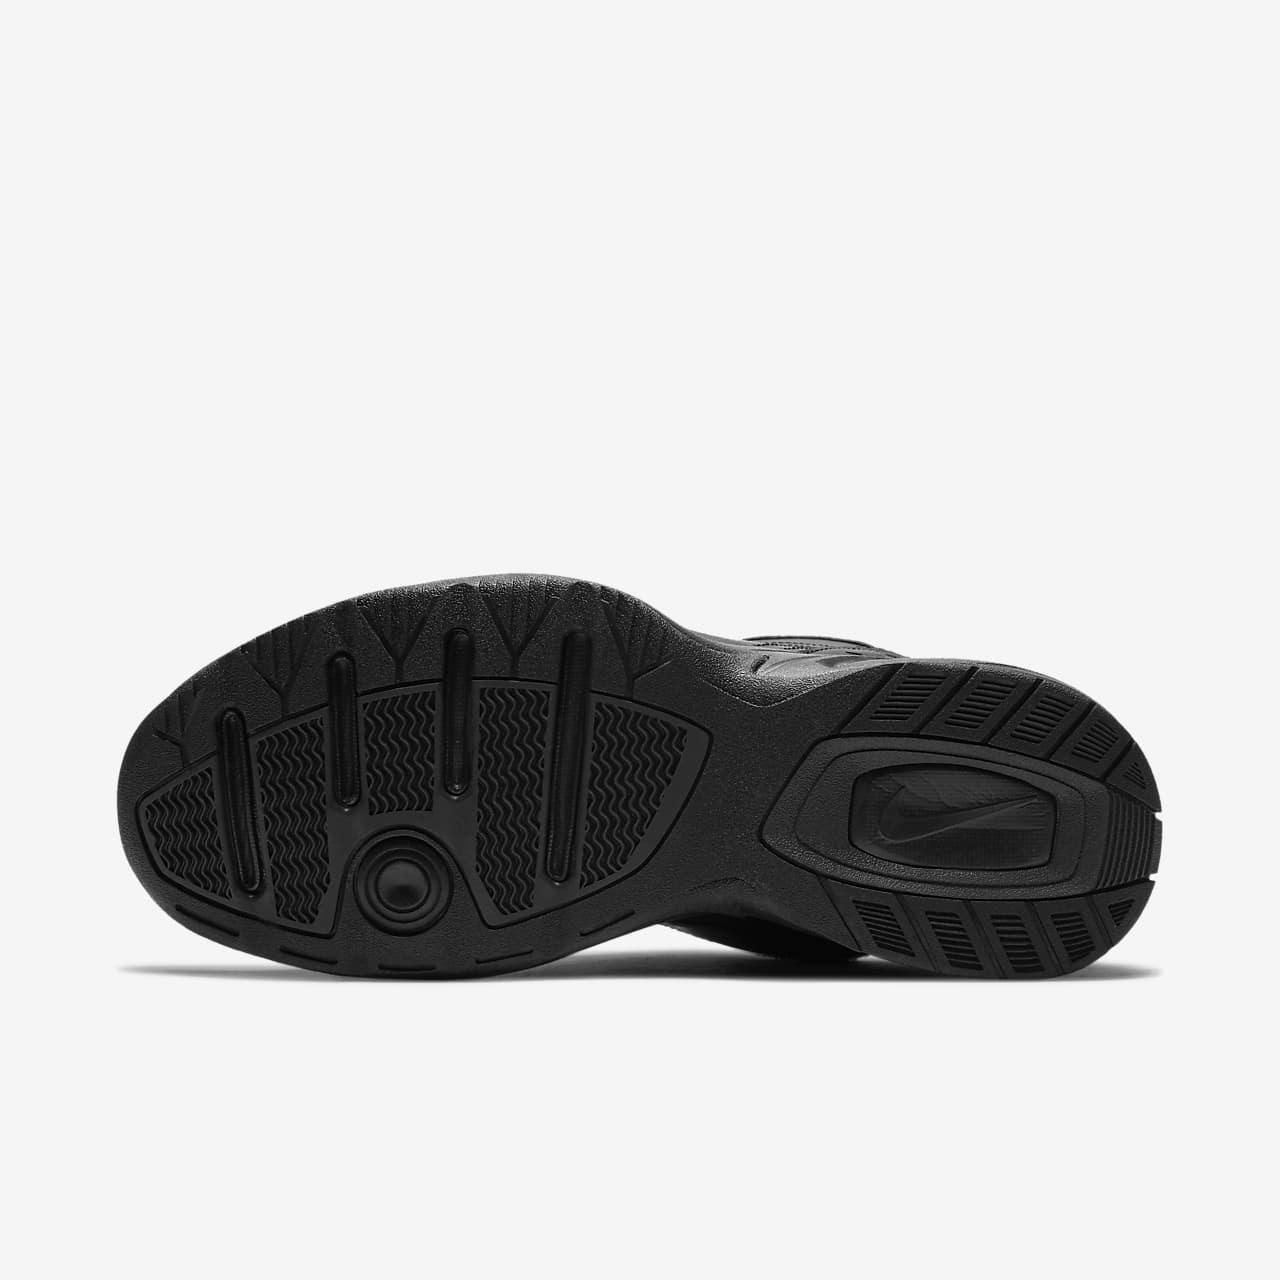 Nike Air Monarch IV Schuh für LifestyleFitnessstudio. Nike DE